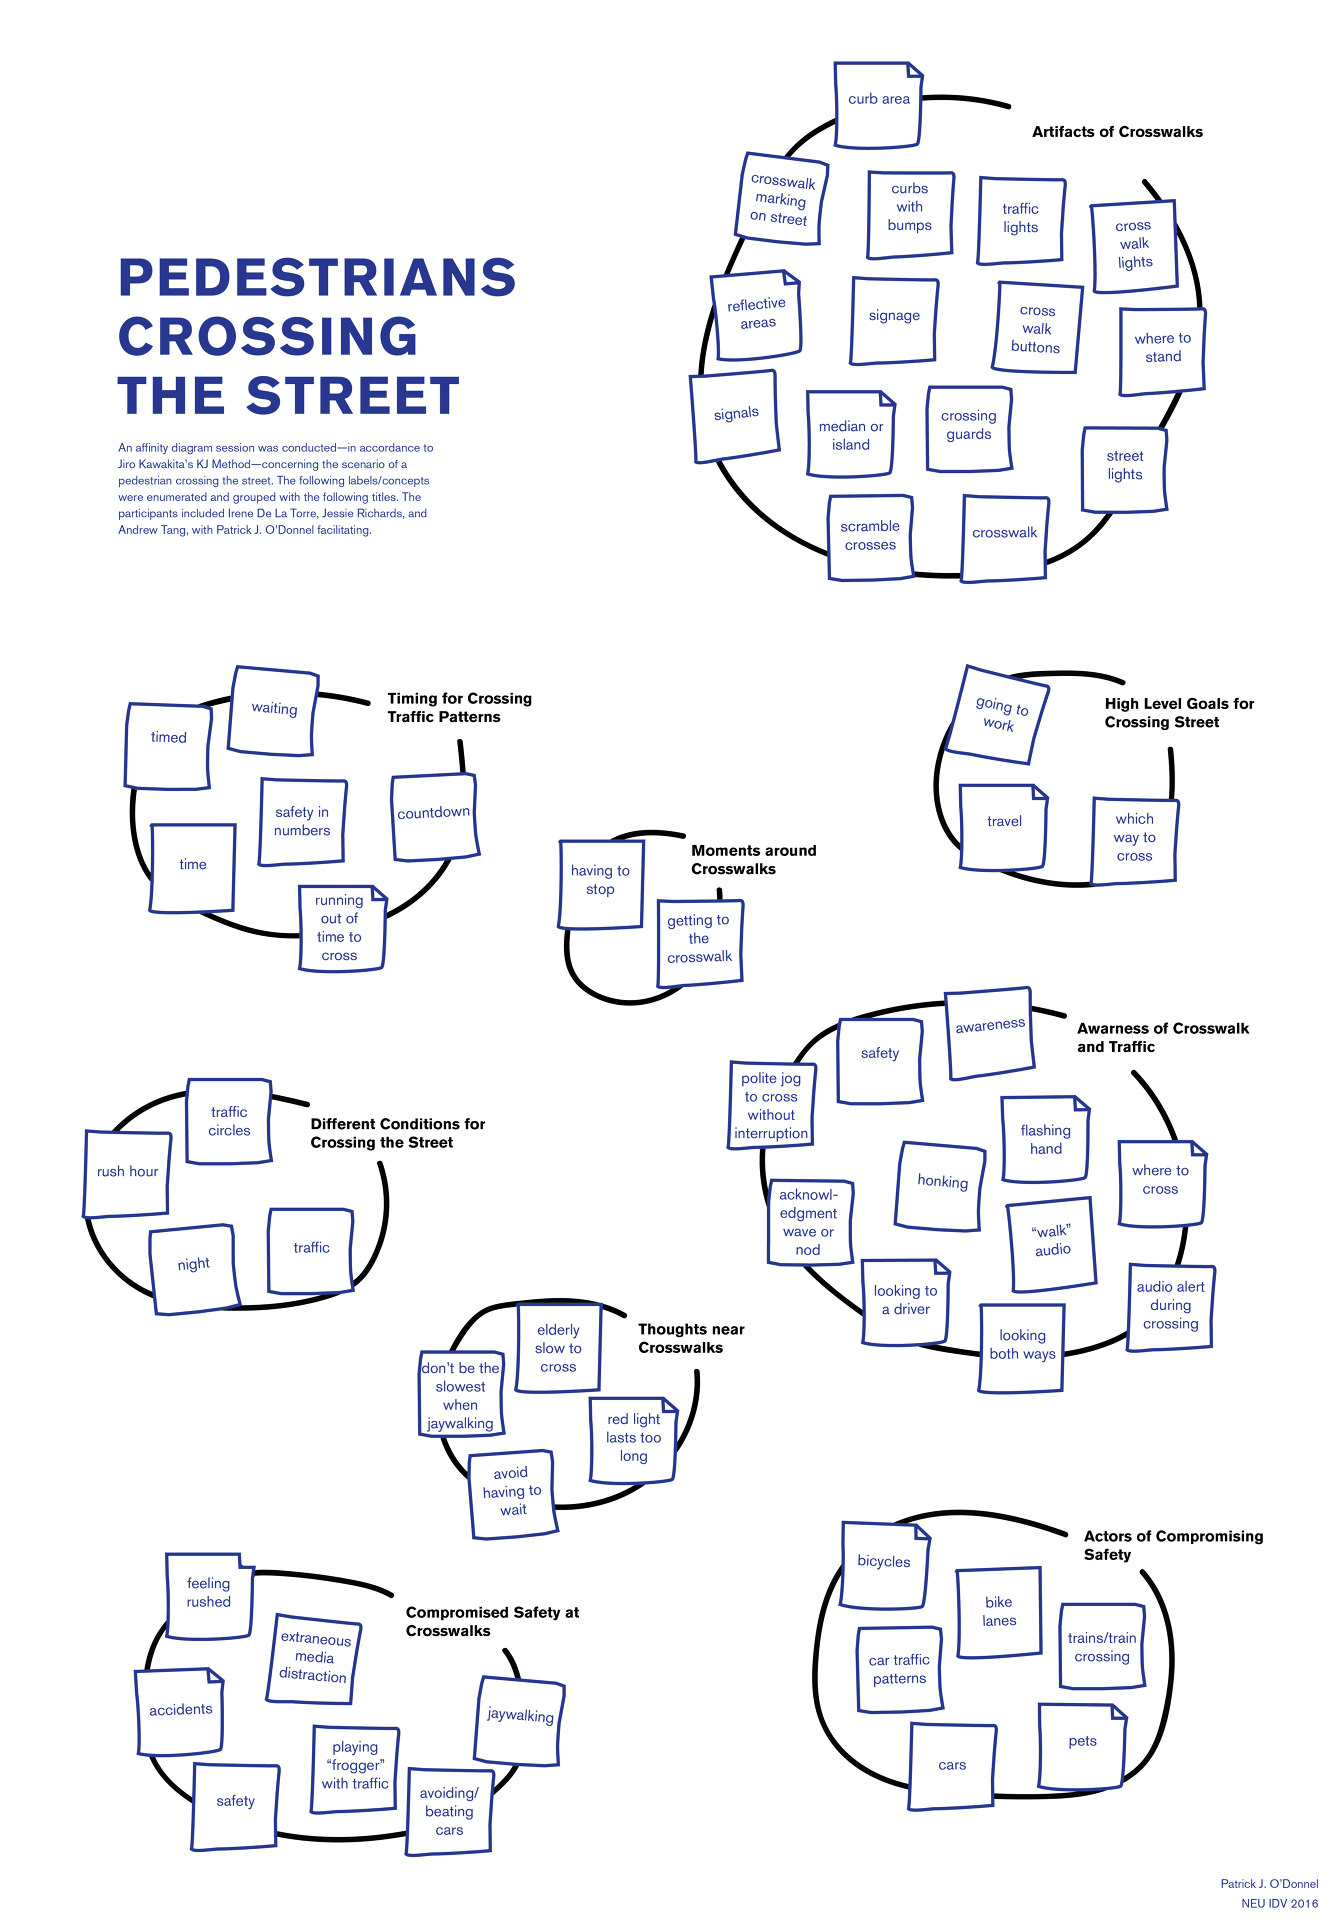 Affinity Diagram affinity diagram: pedestrians at crosswalks - patrick j. o